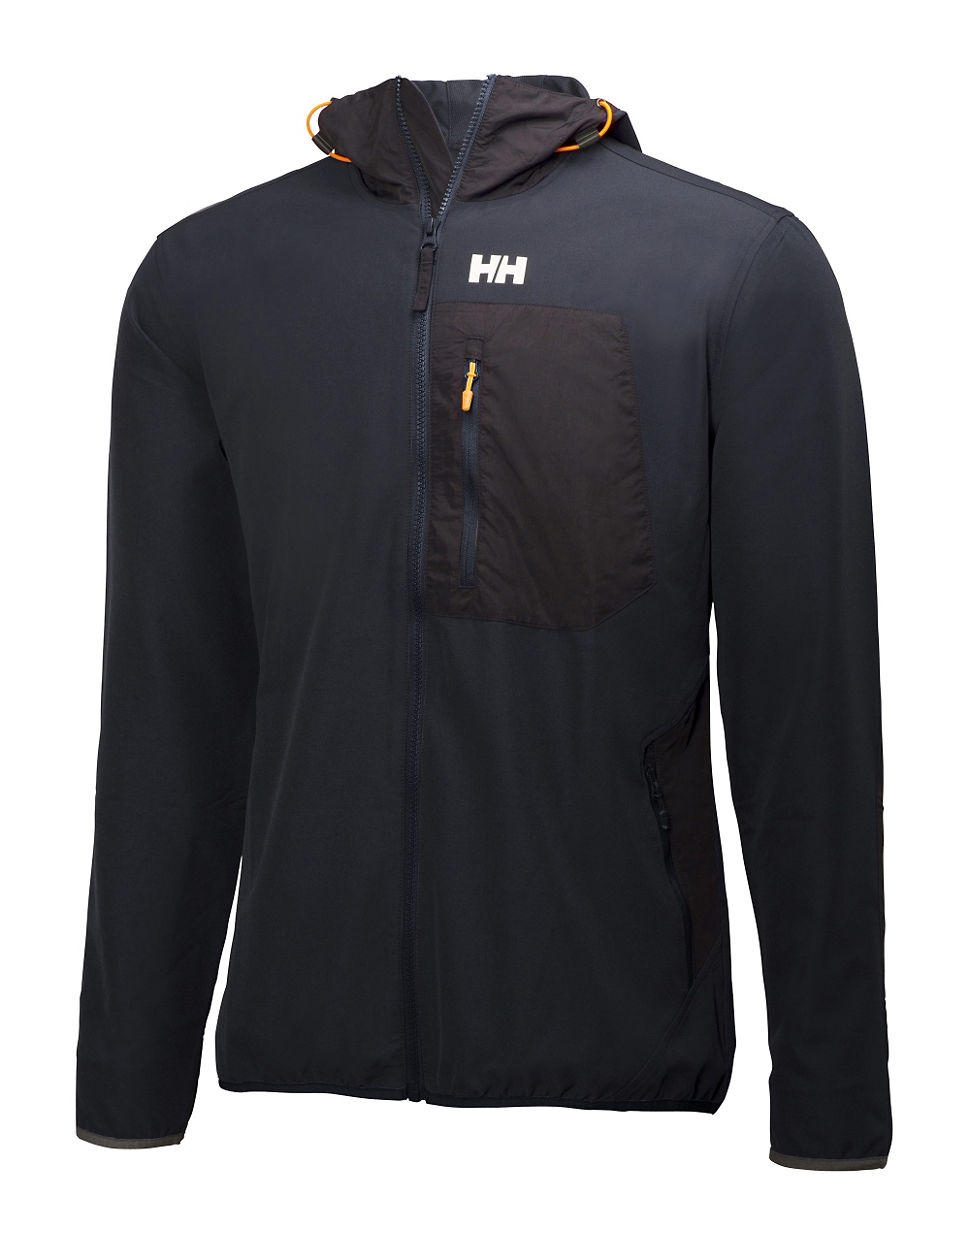 helly hansen jotun softshell jacket in black for men lyst. Black Bedroom Furniture Sets. Home Design Ideas